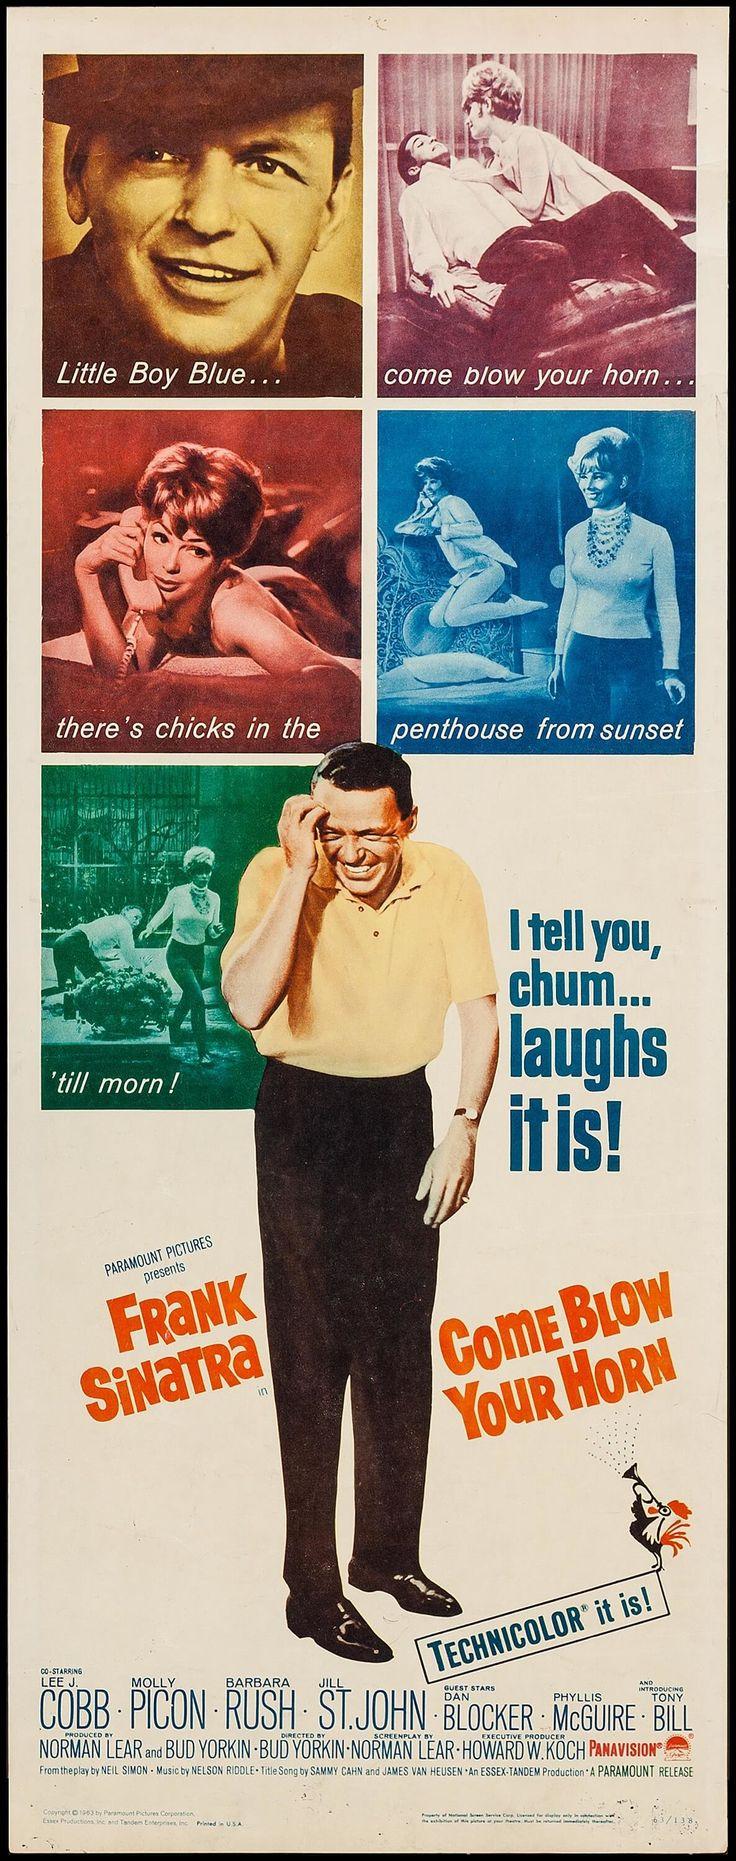 Come Blow Your Horn (1963) Stars: Frank Sinatra, Lee J. Cobb, Molly Picon, Barbara Rush, Jill St. John, Dan Blocker ~Director: Bud Yorkin (Nominated for 4 Golden Globes & 1 Oscar)